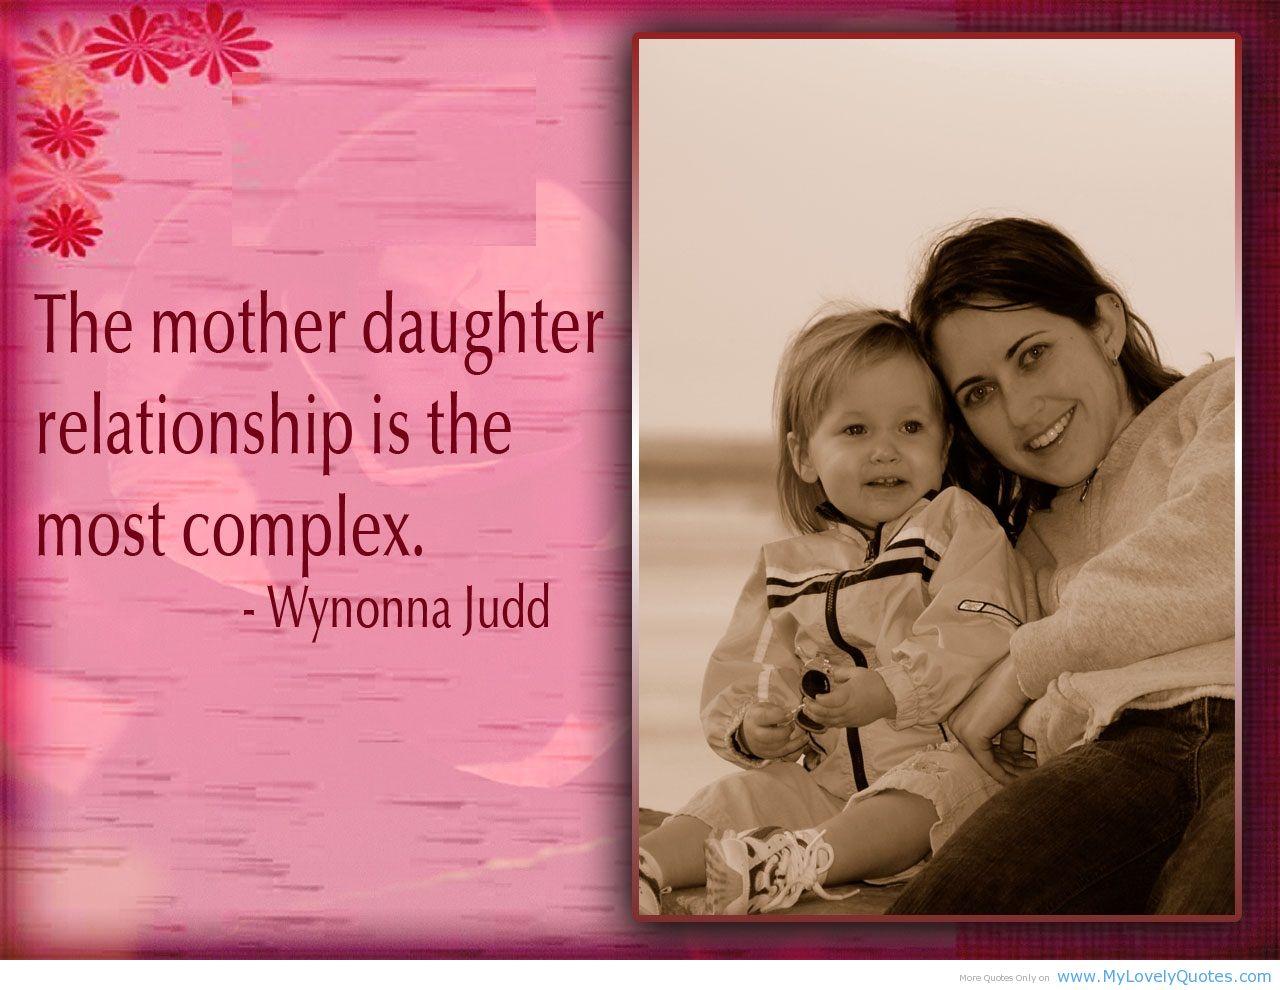 Wynonna Judd's quote #2